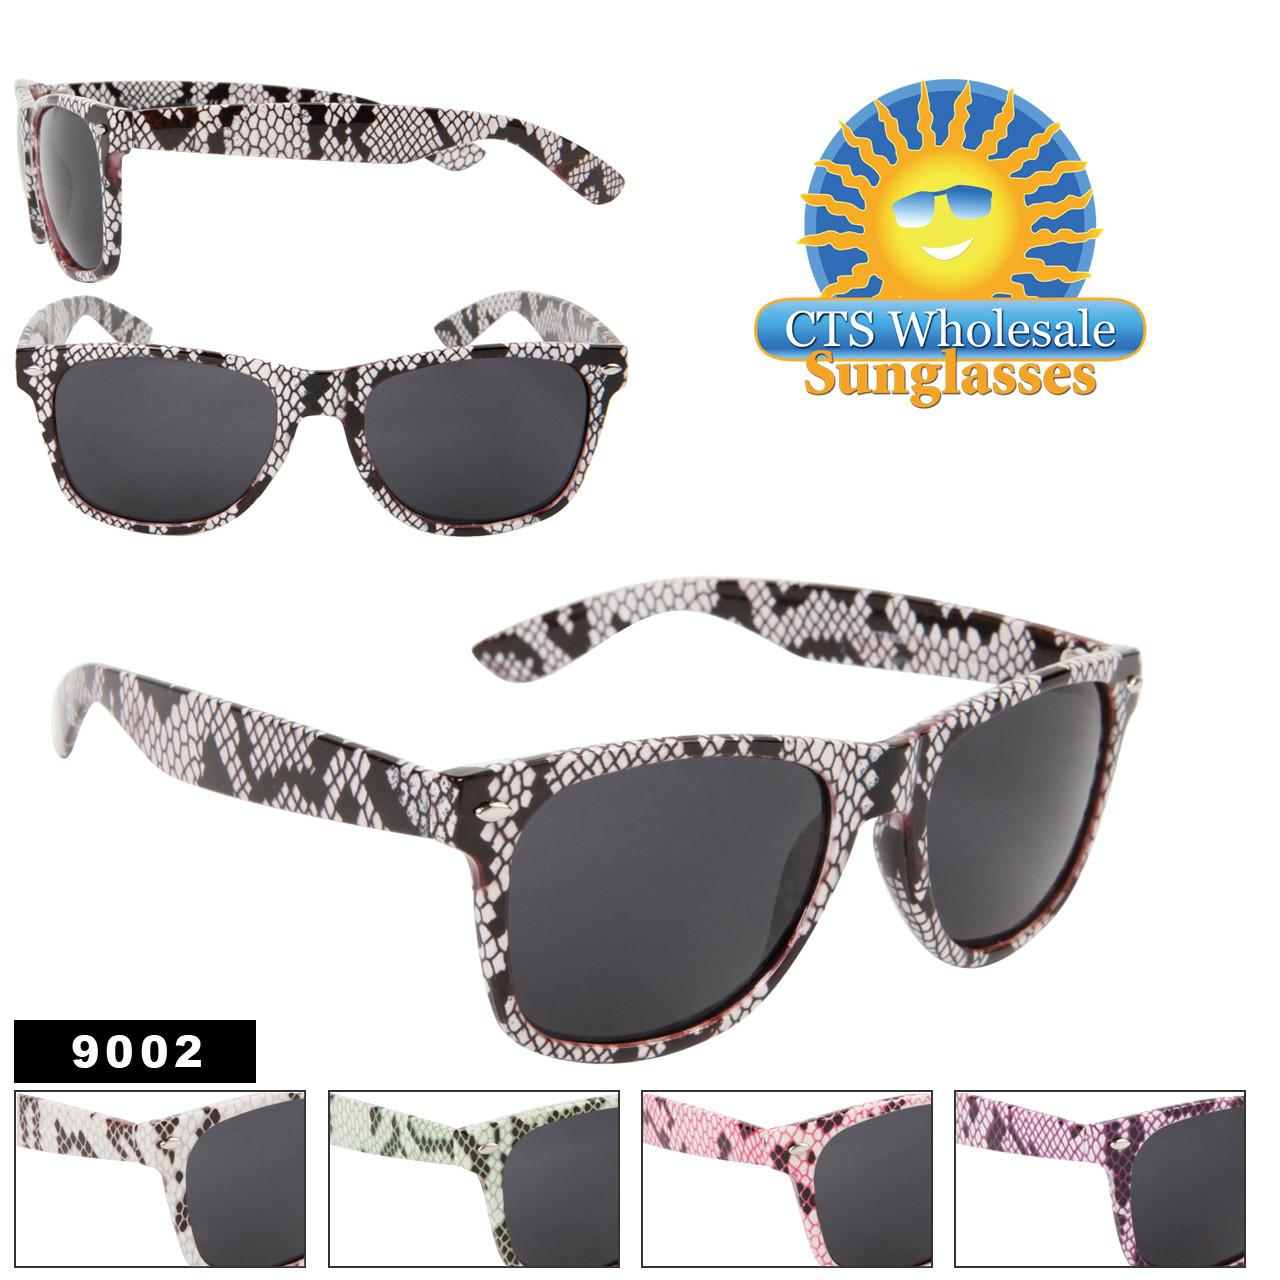 #9002 Snake Skin California Classics Sunglasses